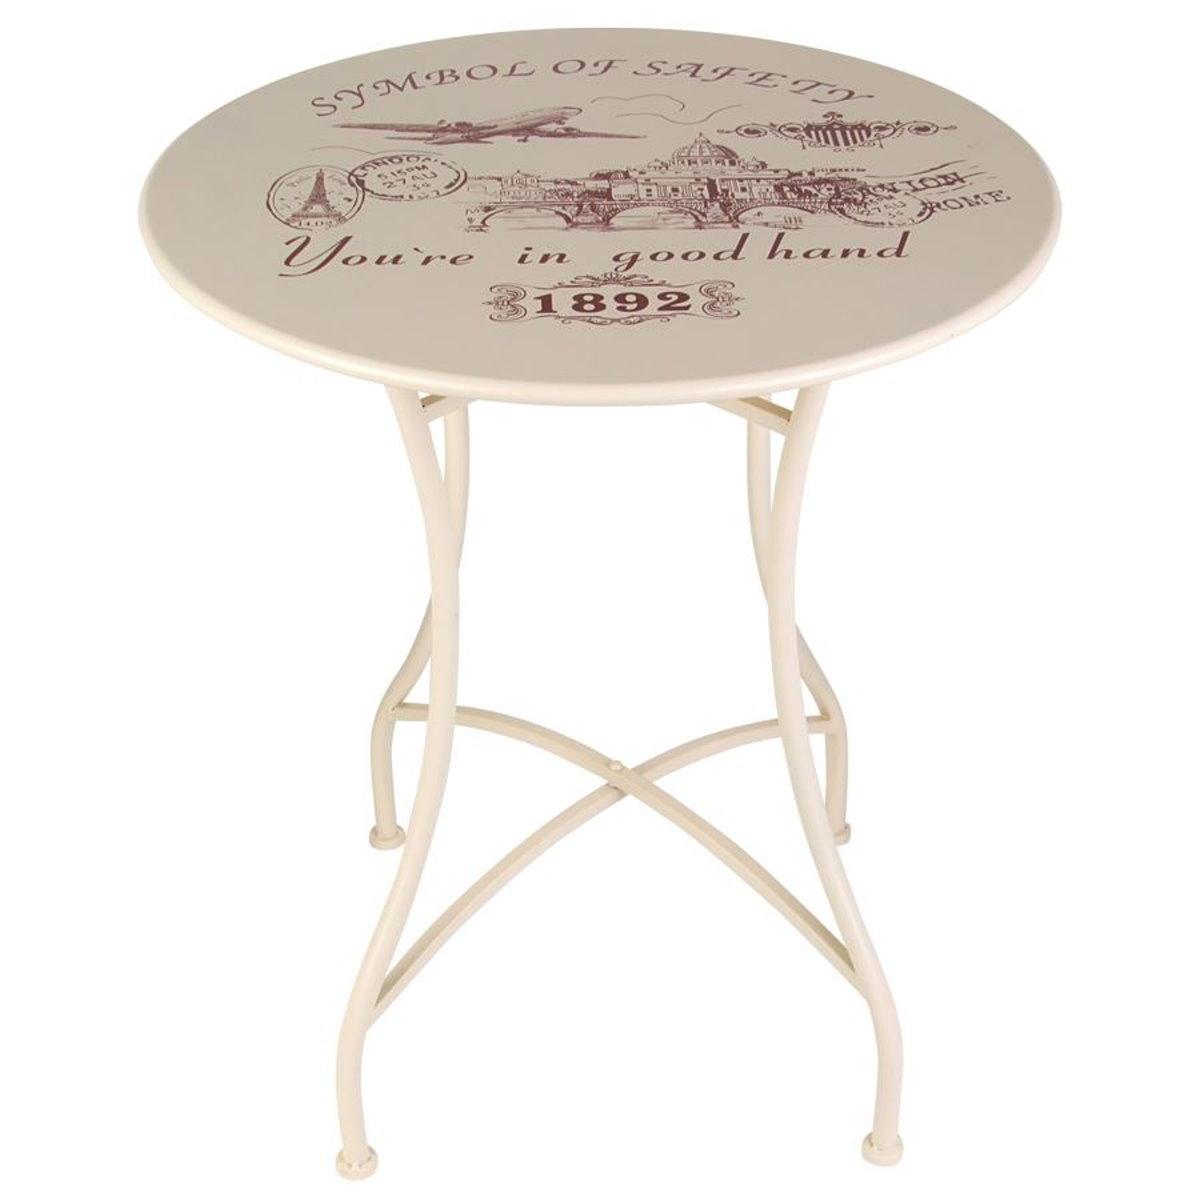 3tlg vintage set de balcon look shabby jardin terrasse m tal chaise table ebay. Black Bedroom Furniture Sets. Home Design Ideas